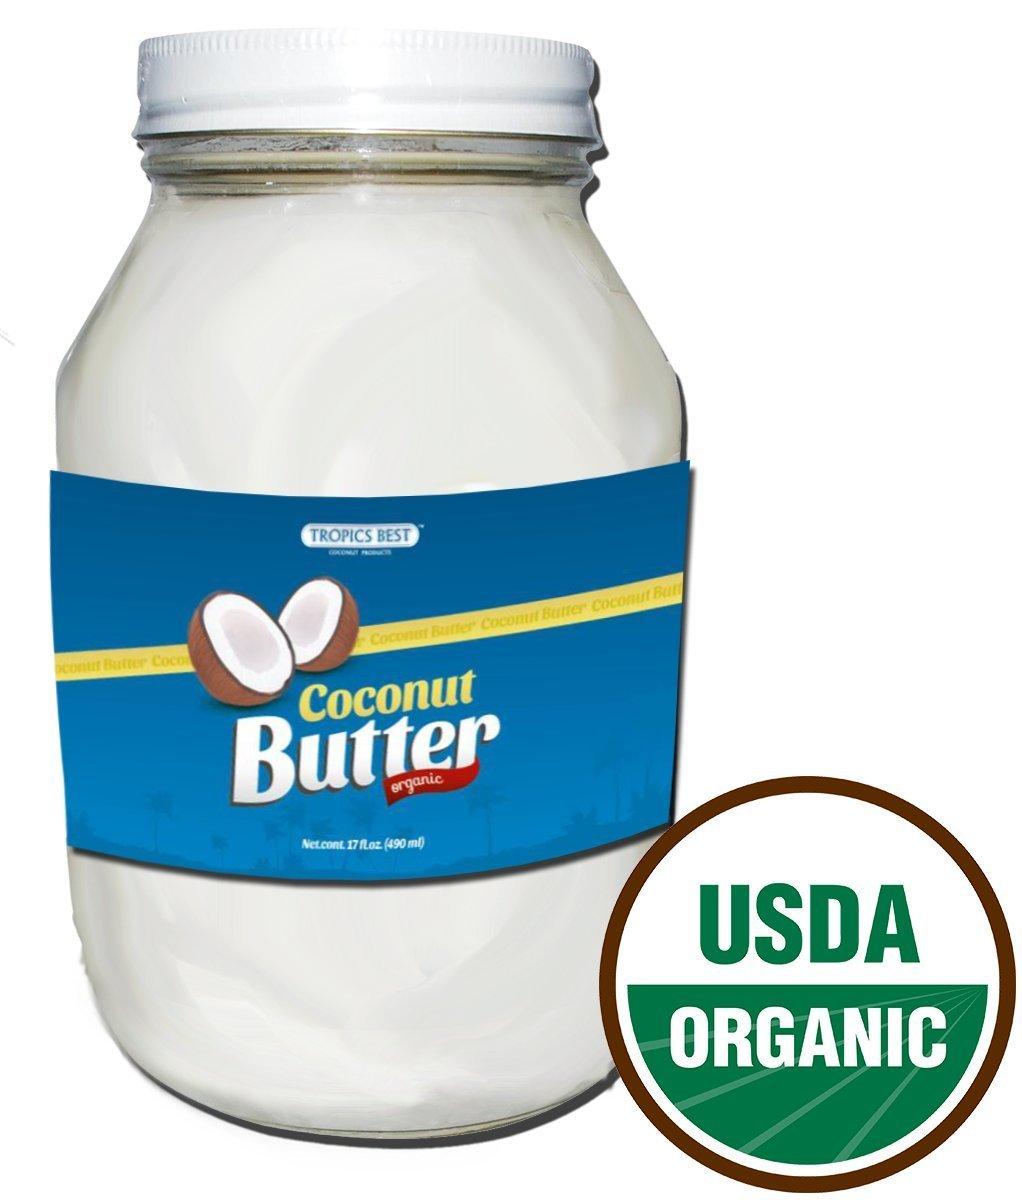 17 Oz Coconut Butter - 100% USDA Certified Organic Virgin